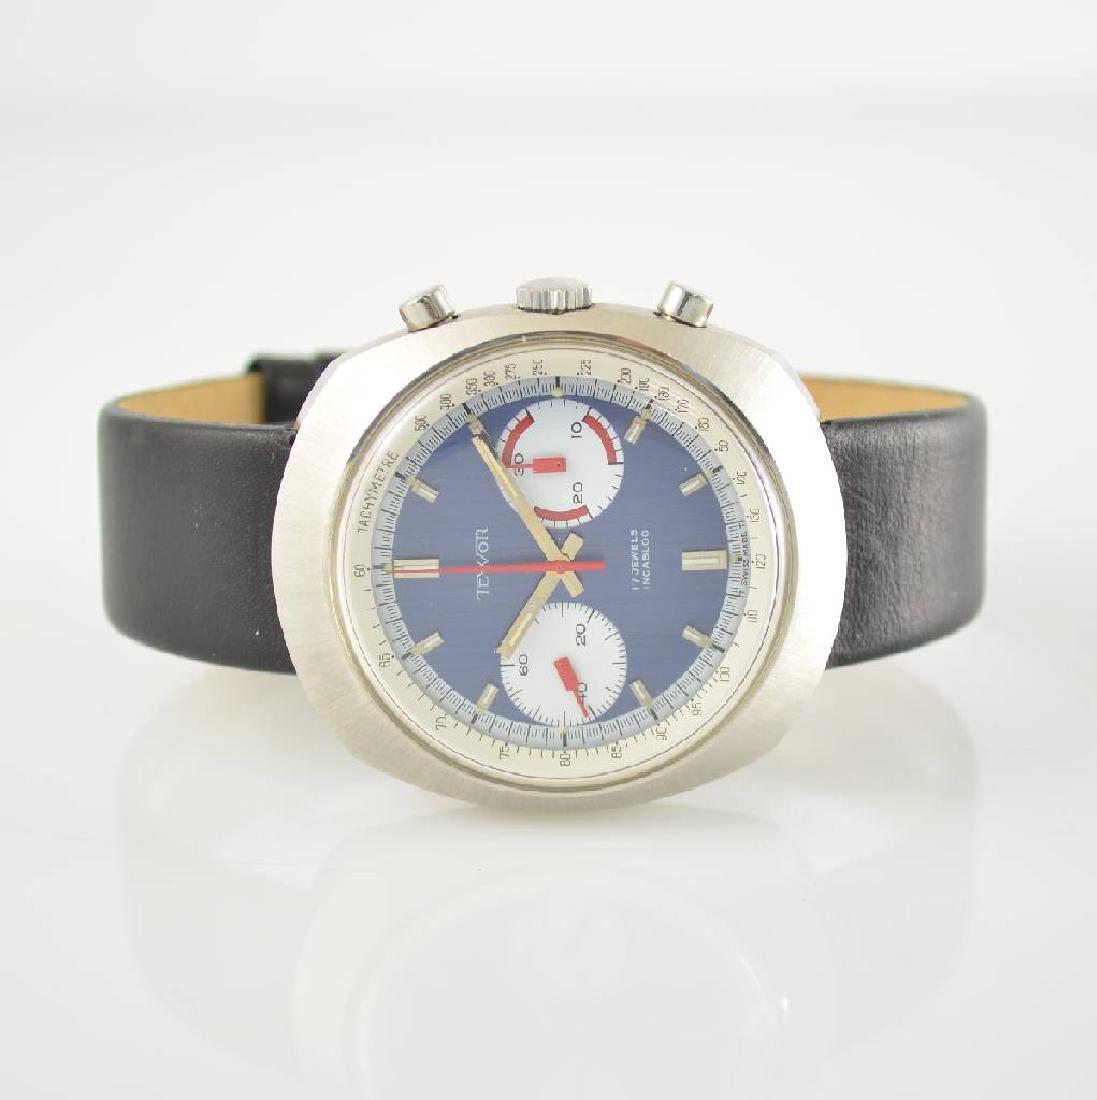 TEWOR unworn gents wristwatch with chronograph